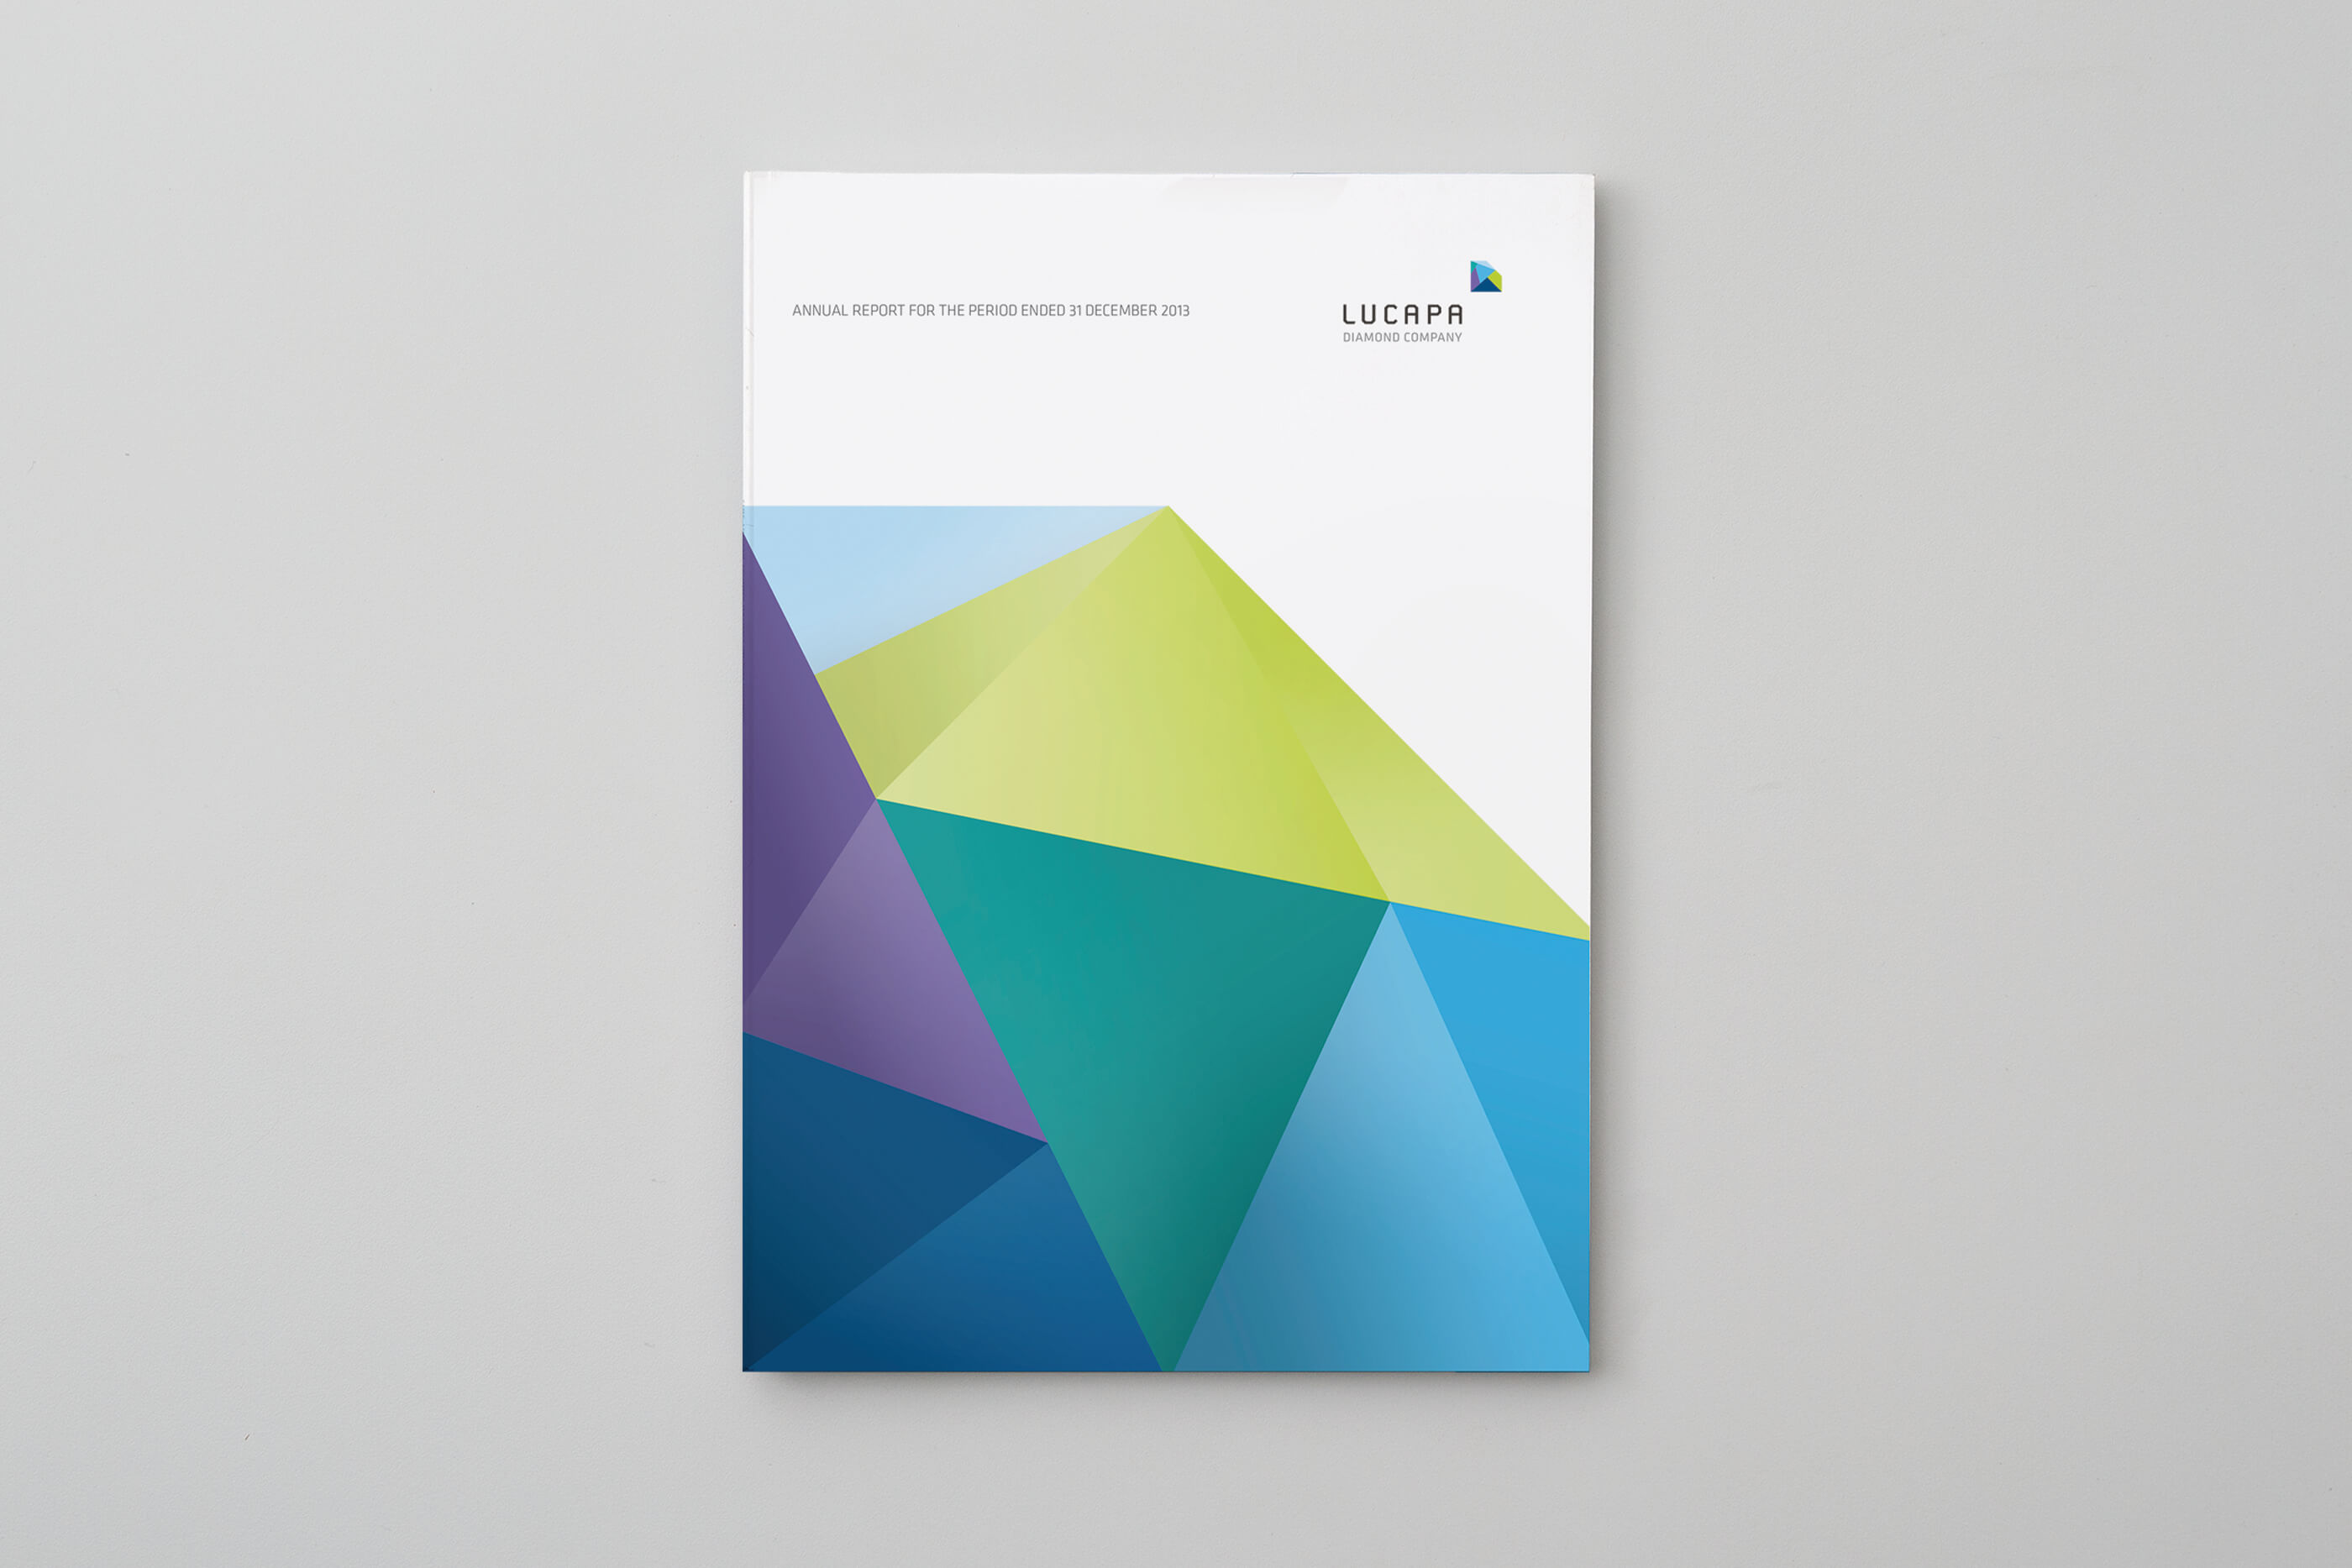 lucapa_annual_report_2013